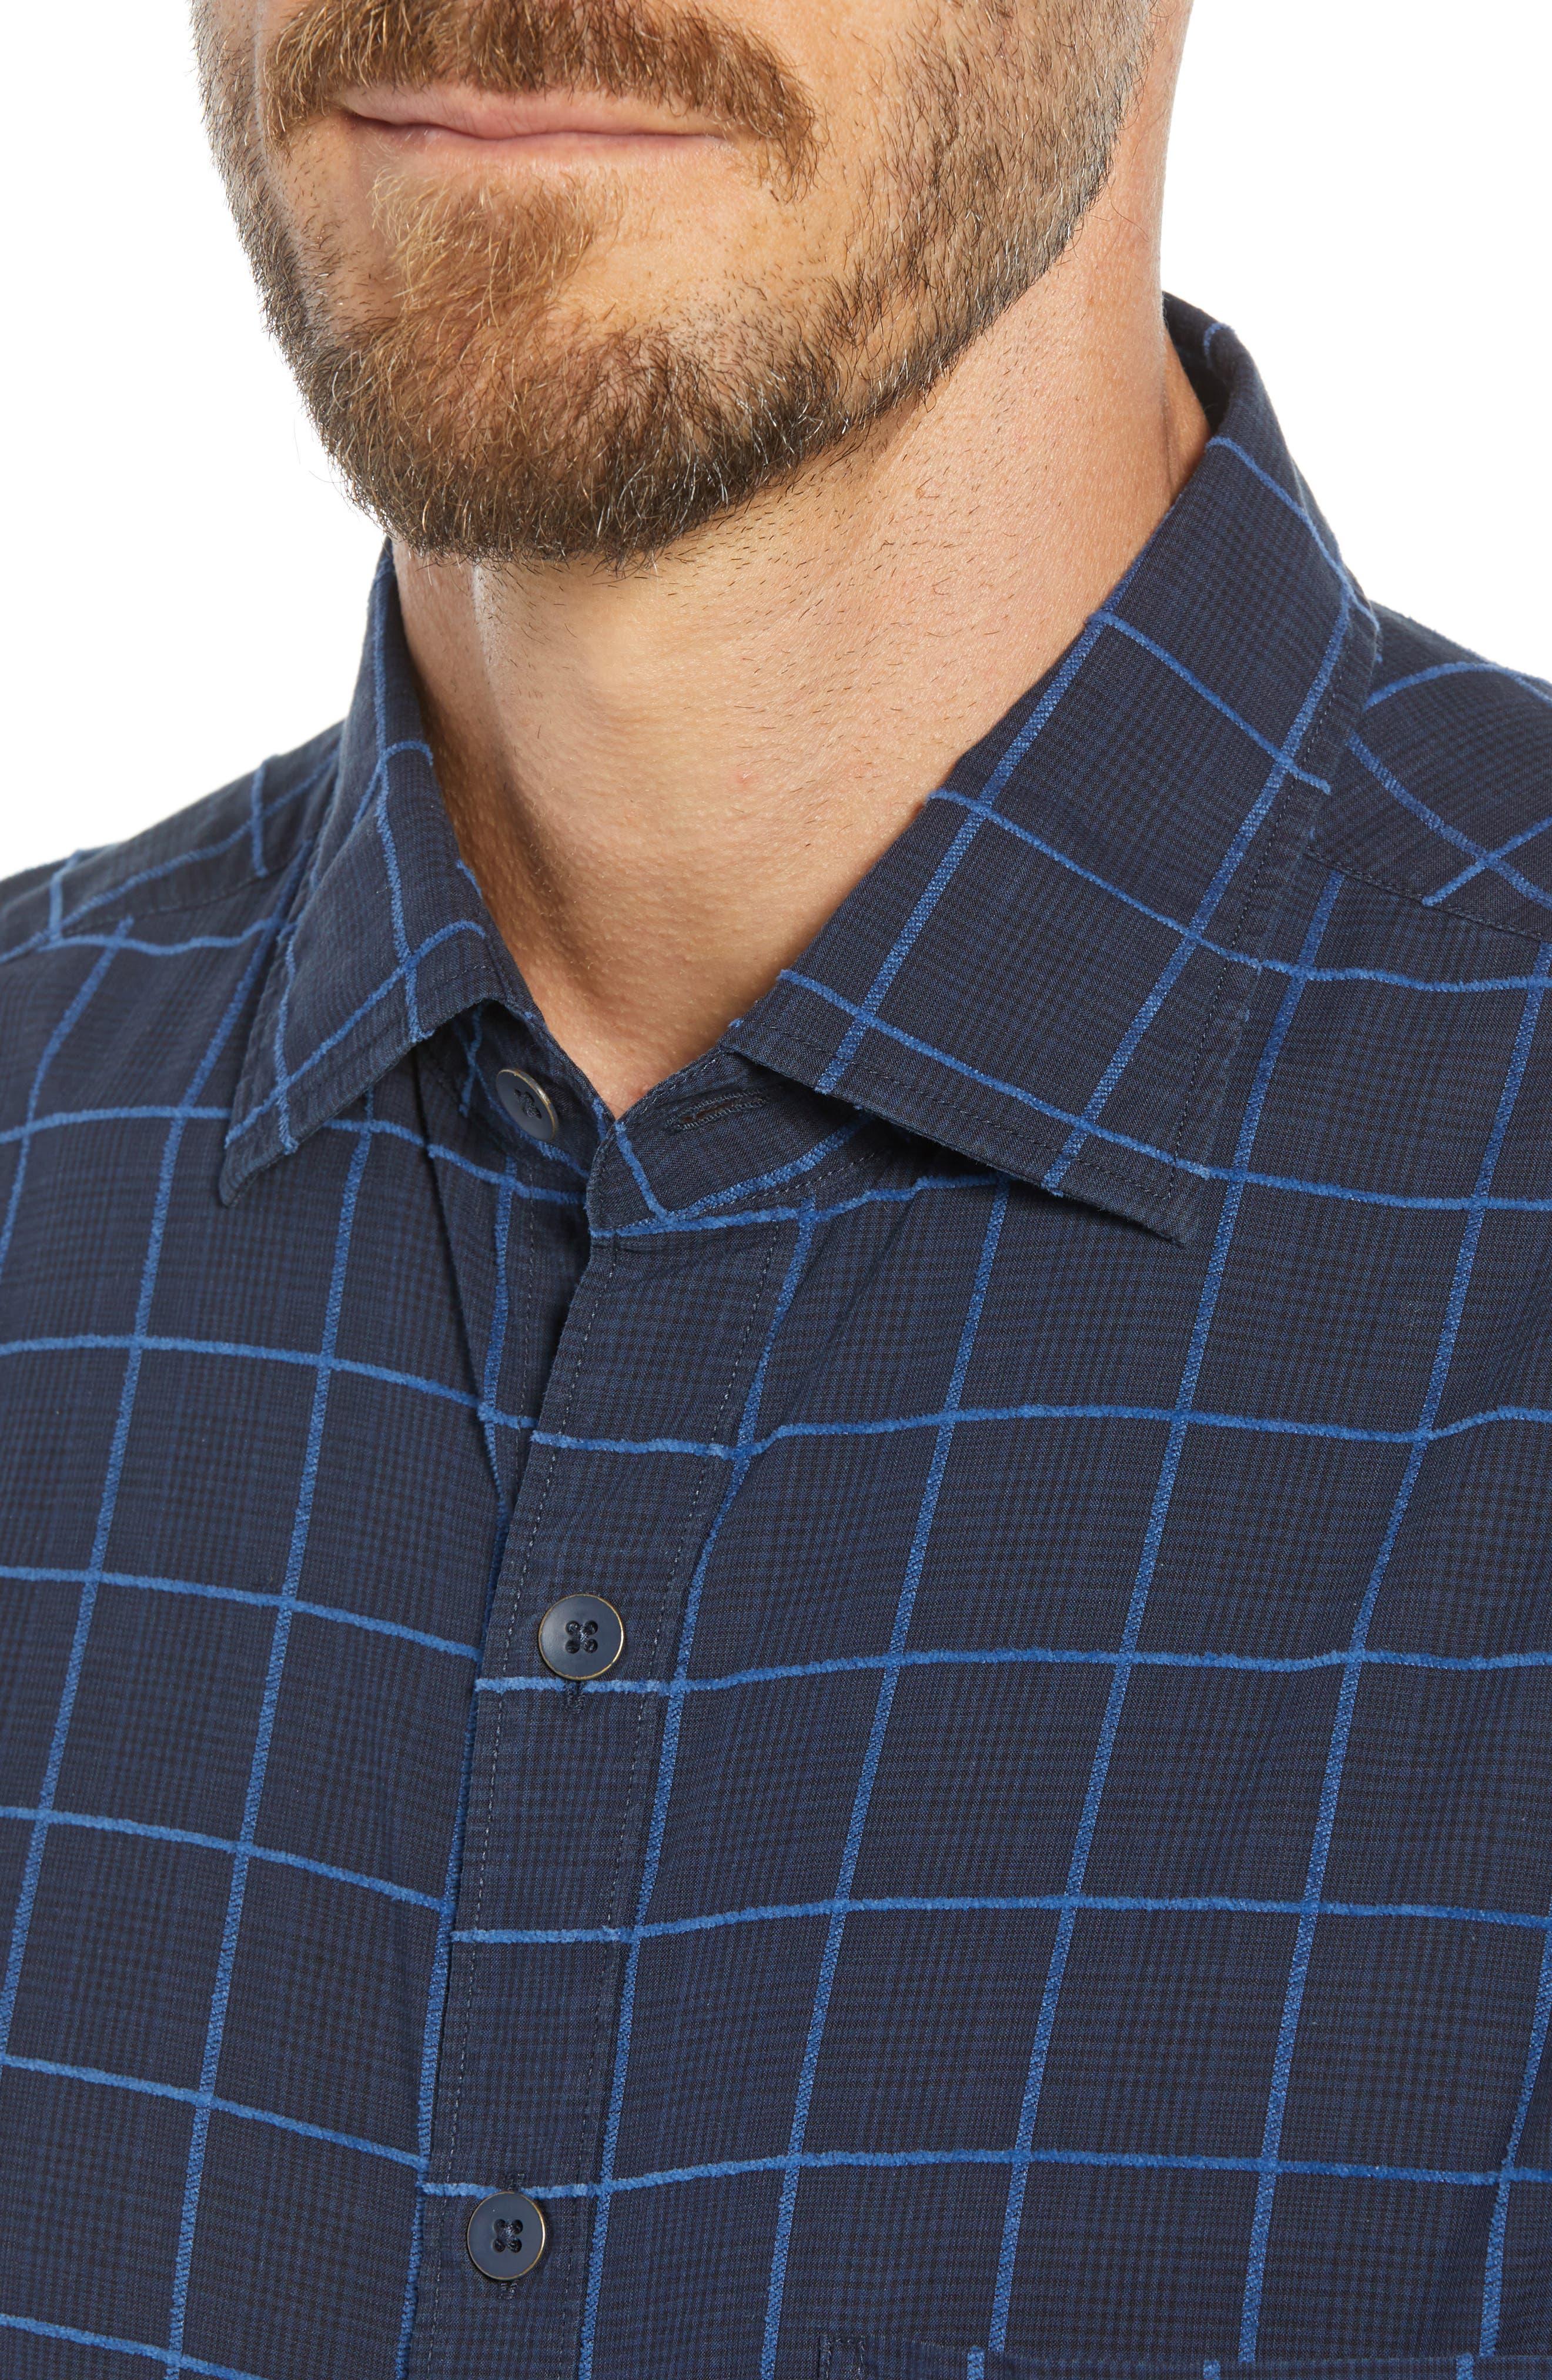 RODD & GUNN, Hindley Creek Regular Fit Sport Shirt, Alternate thumbnail 2, color, NAVY